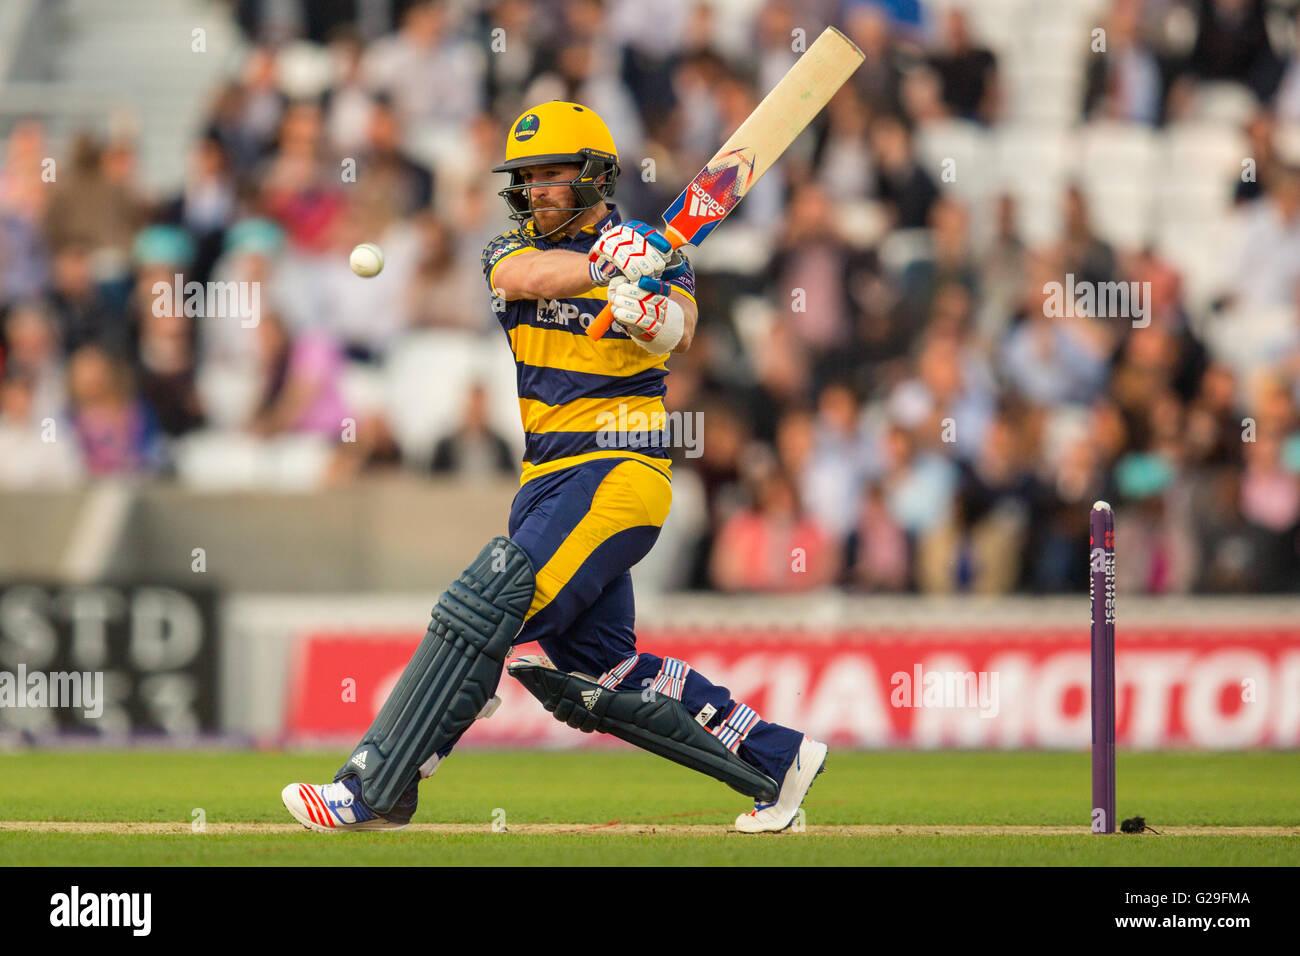 London, UK. 26. Mai 2016. David Lloyd Wimper für Glamorgan in die T20-Explosion-Cricket-Match im Oval. David Stockbild